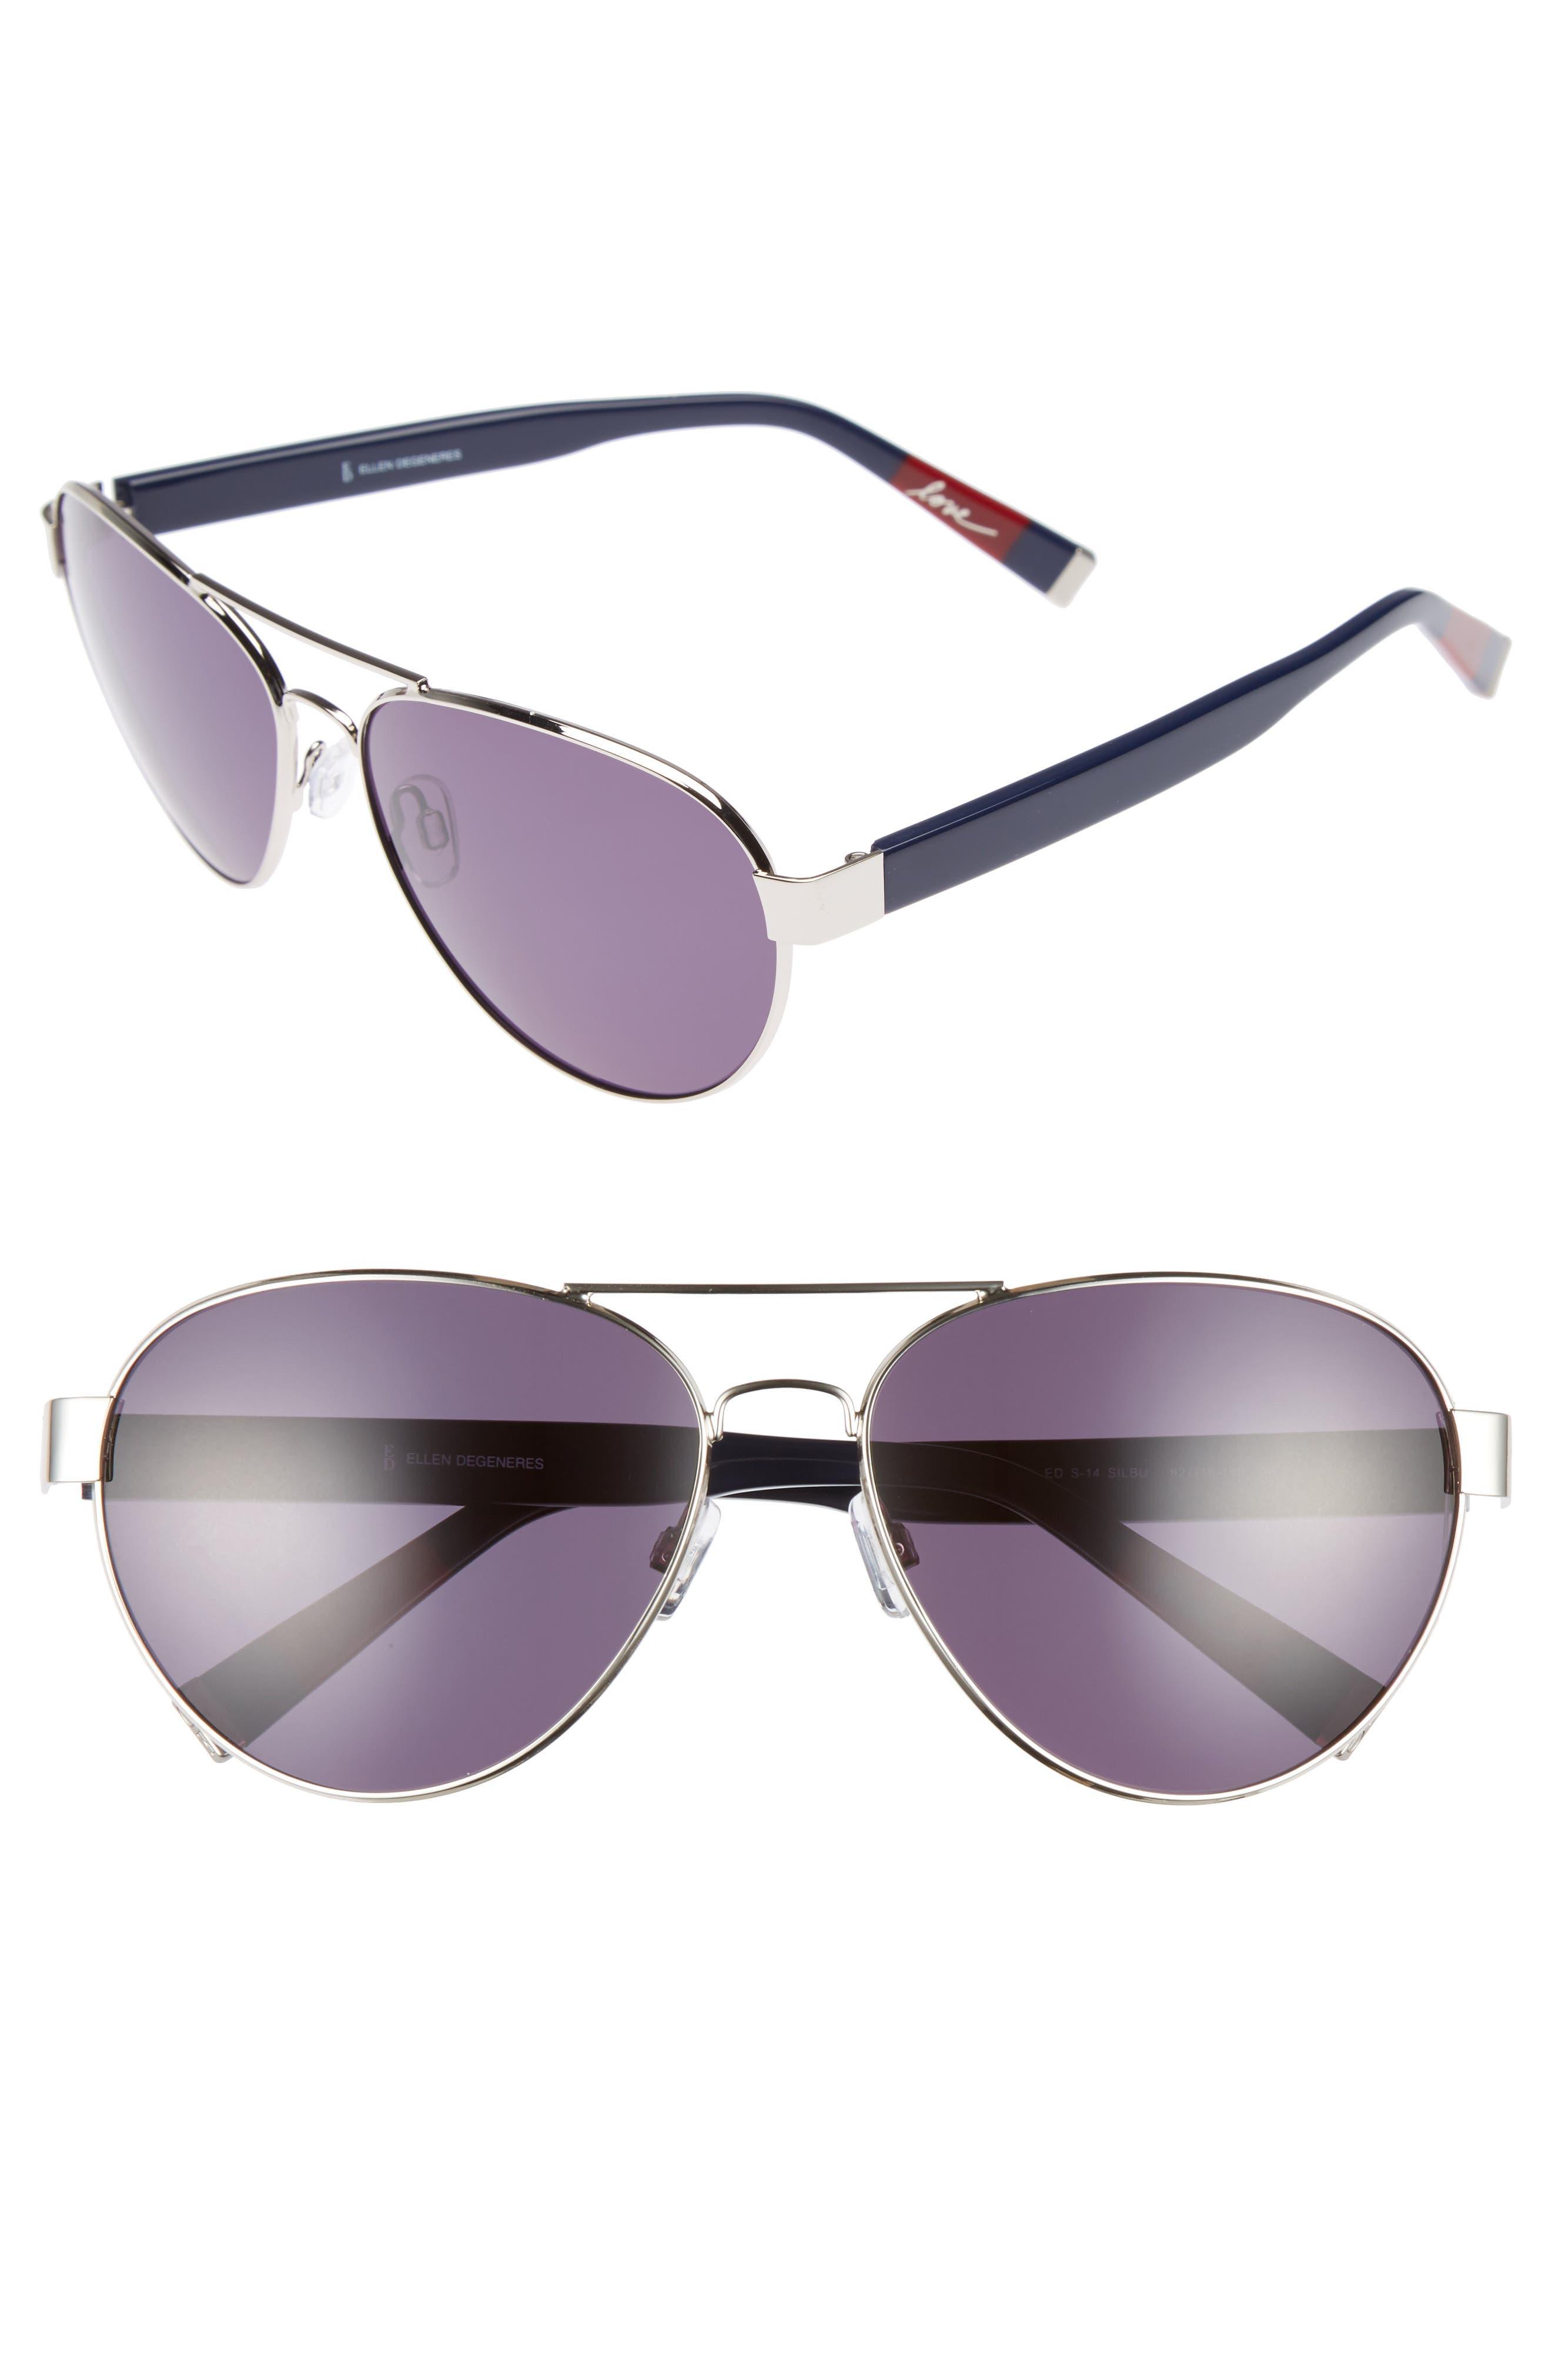 62mm Oversize Aviator Sunglasses,                         Main,                         color, SILVER BLUE